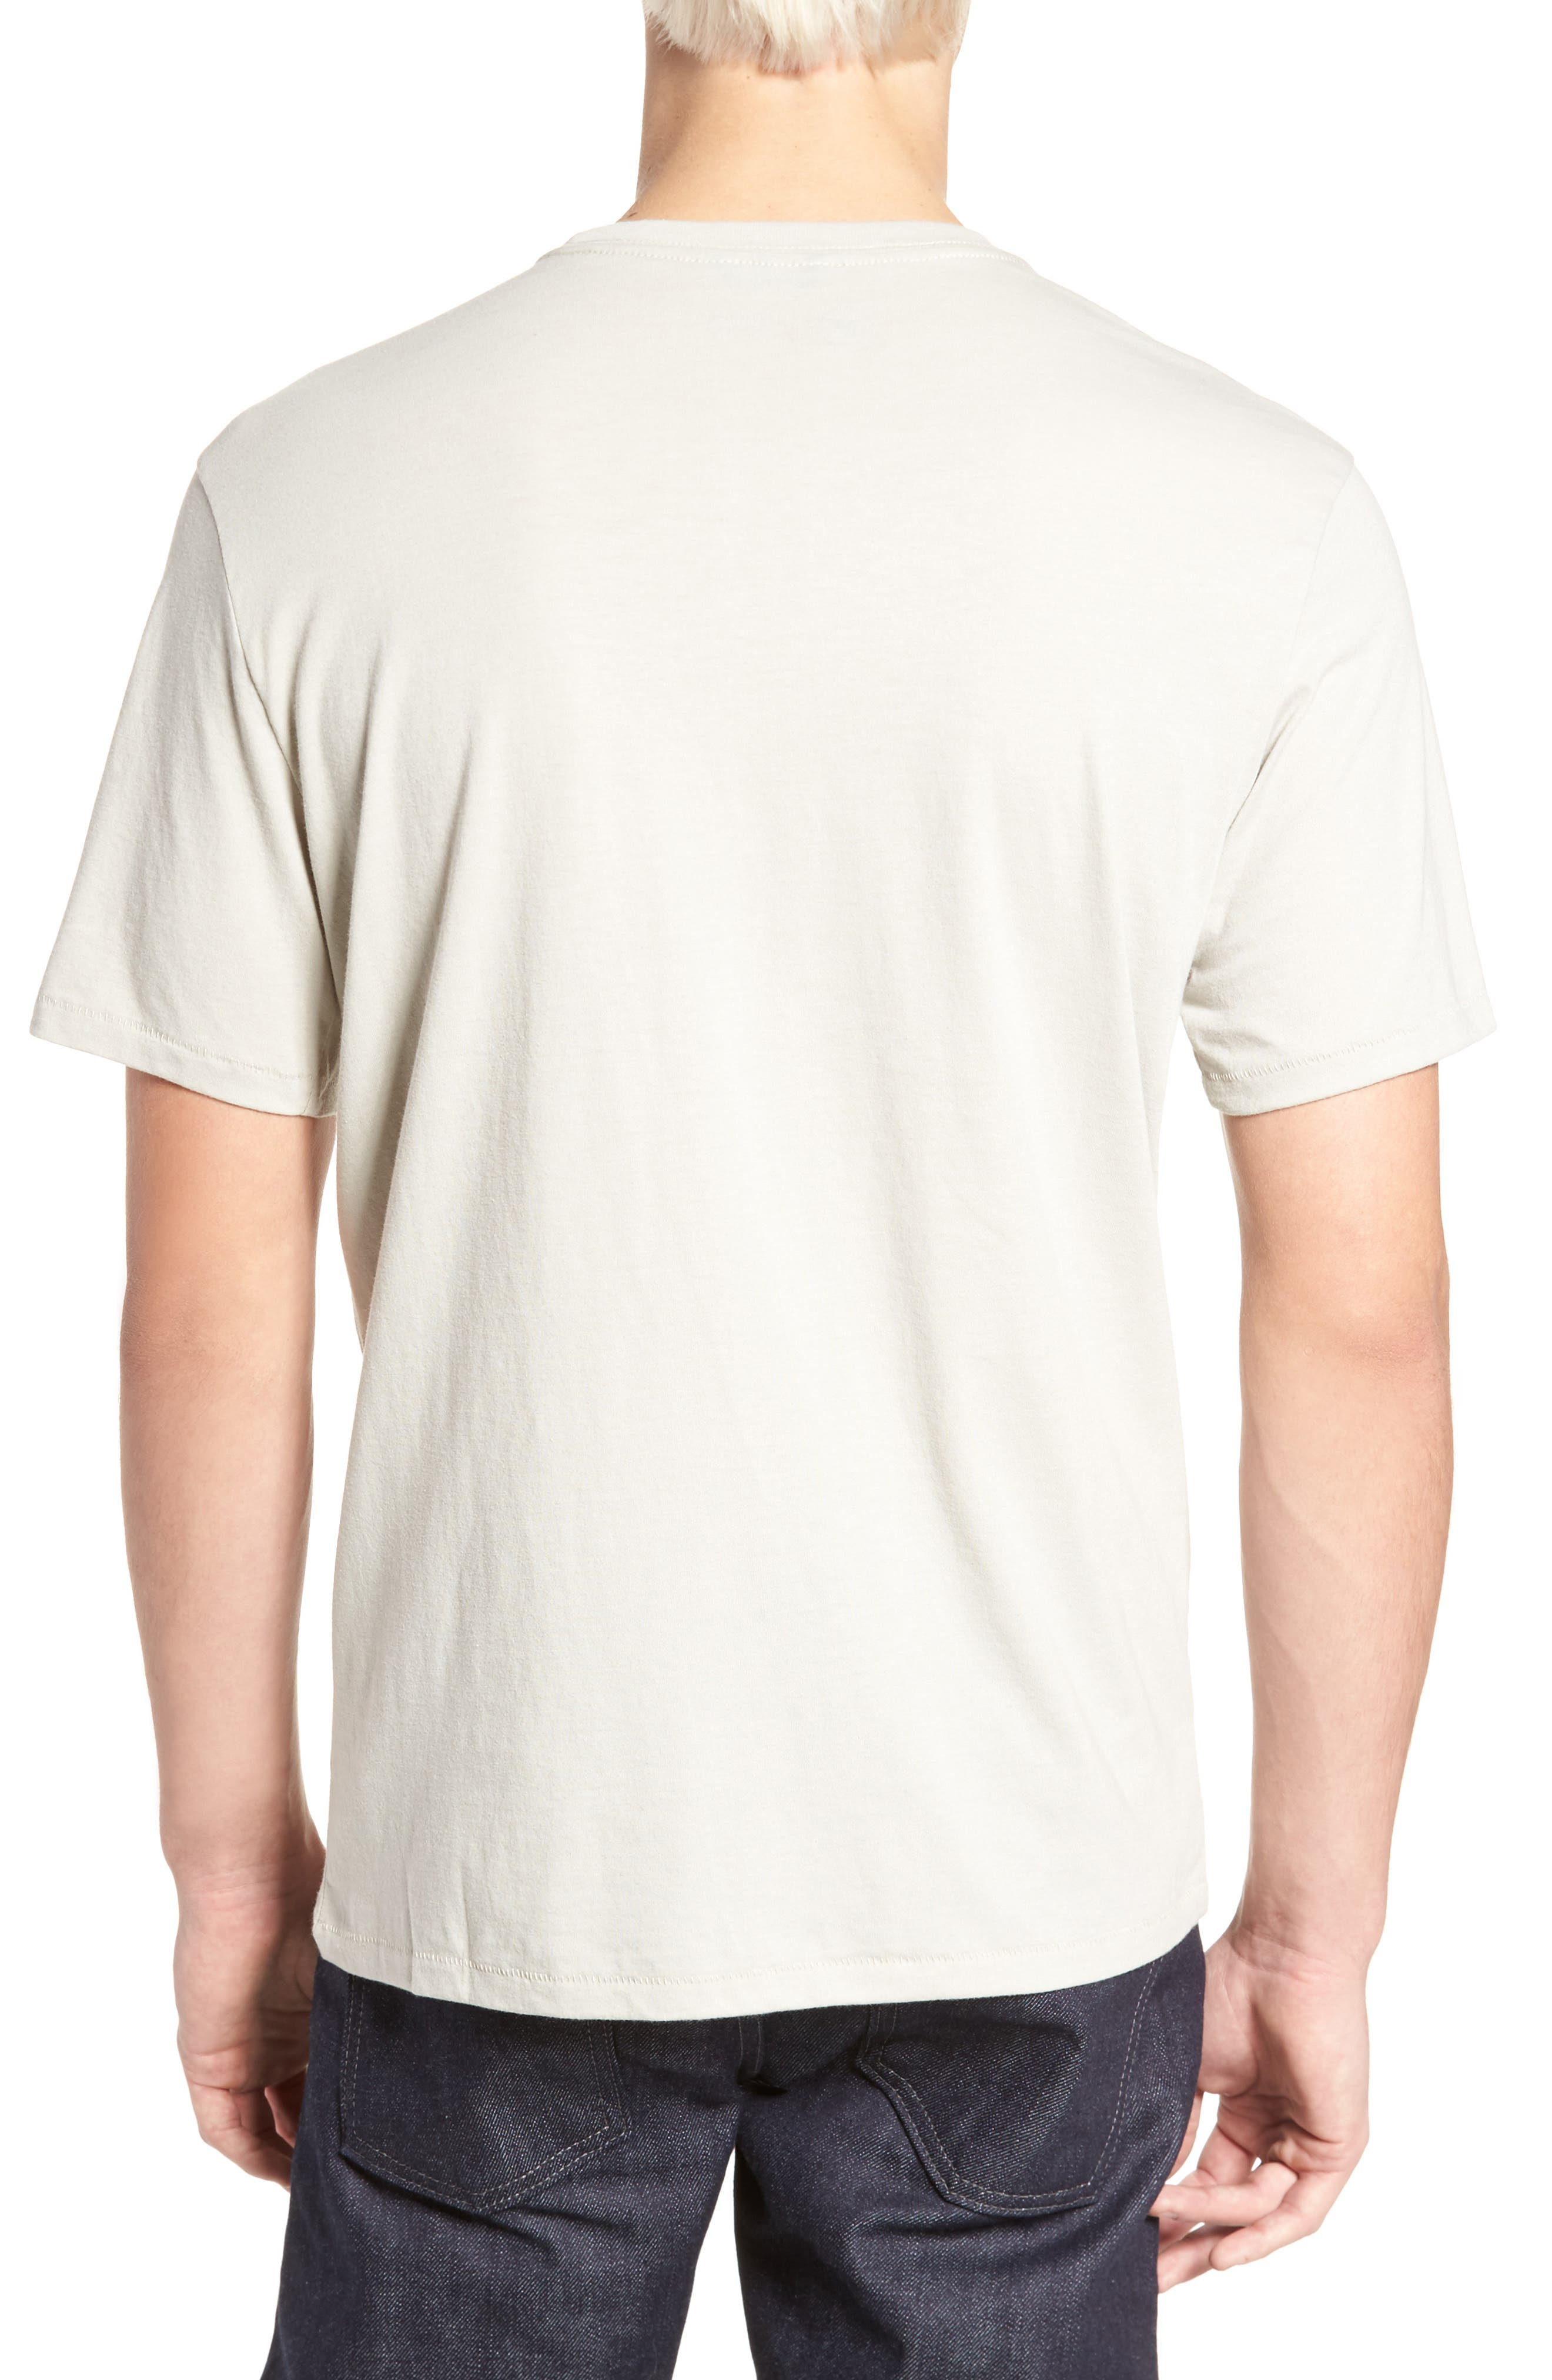 Garth Premium T-Shirt,                             Alternate thumbnail 2, color,                             020